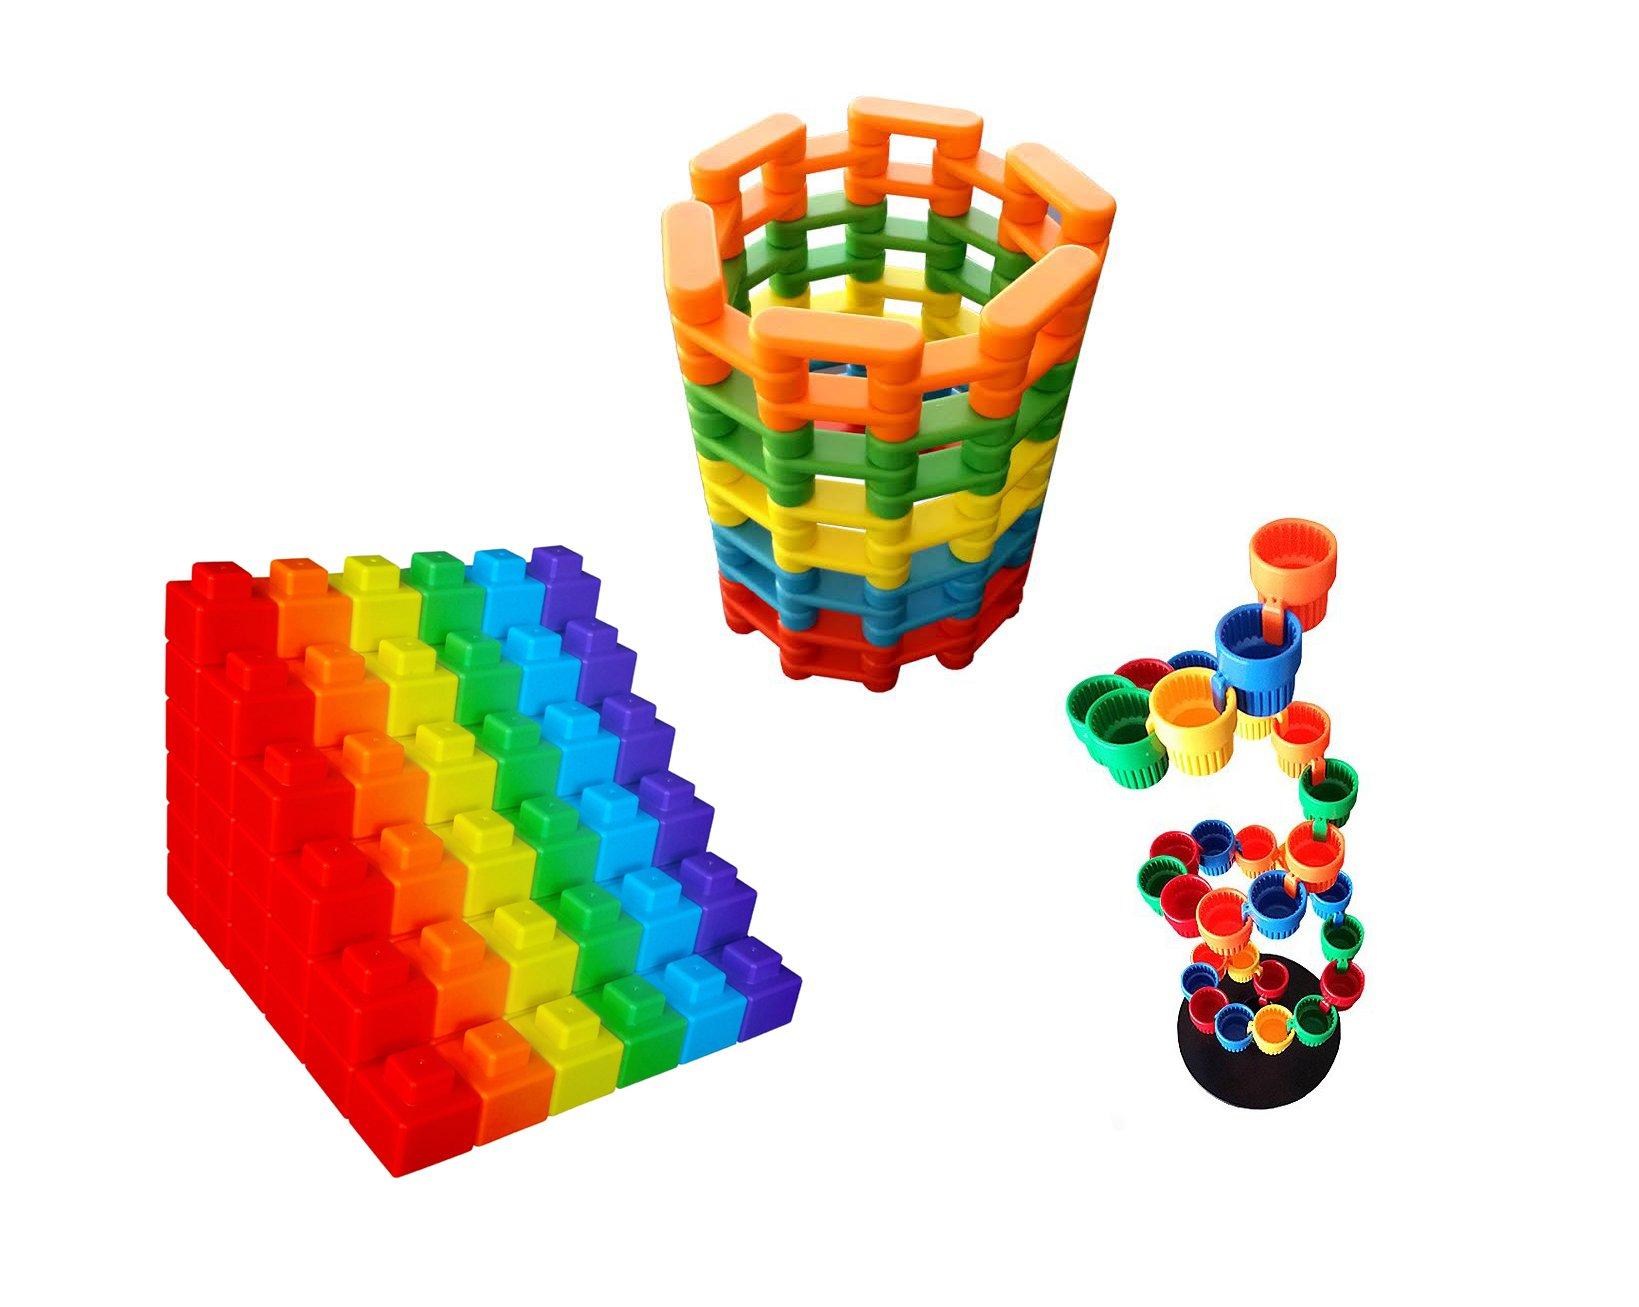 Magz Bundle of Three Bricks 40 Magnetic Building Set Pixels 48 Magnetic Building Blocks Cup Up 50 Building and Stacking Cups, Bundle of Three